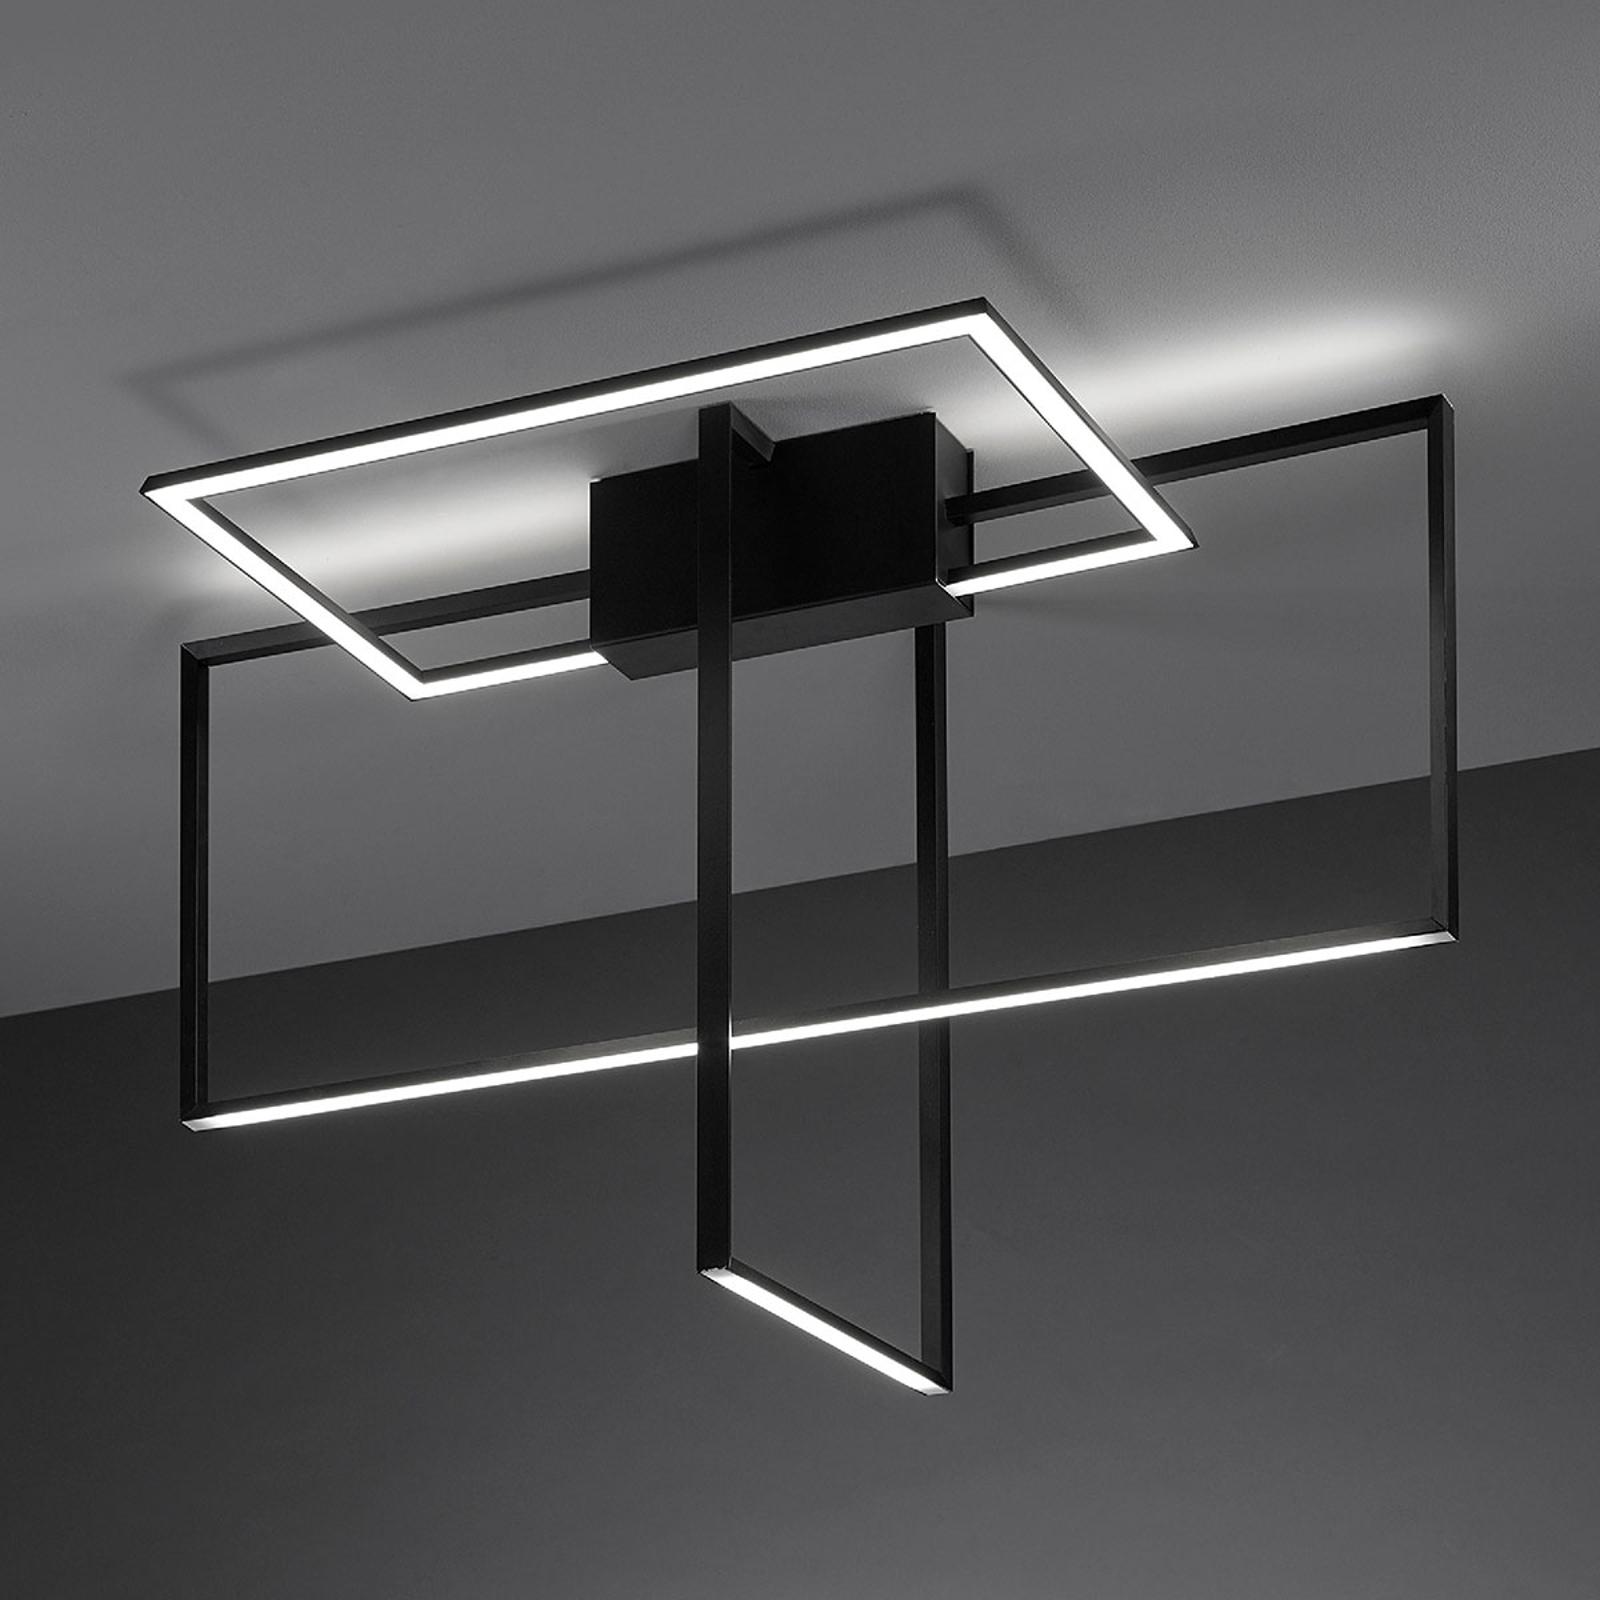 Lampa sufitowa LED Area w kolorze czarnym